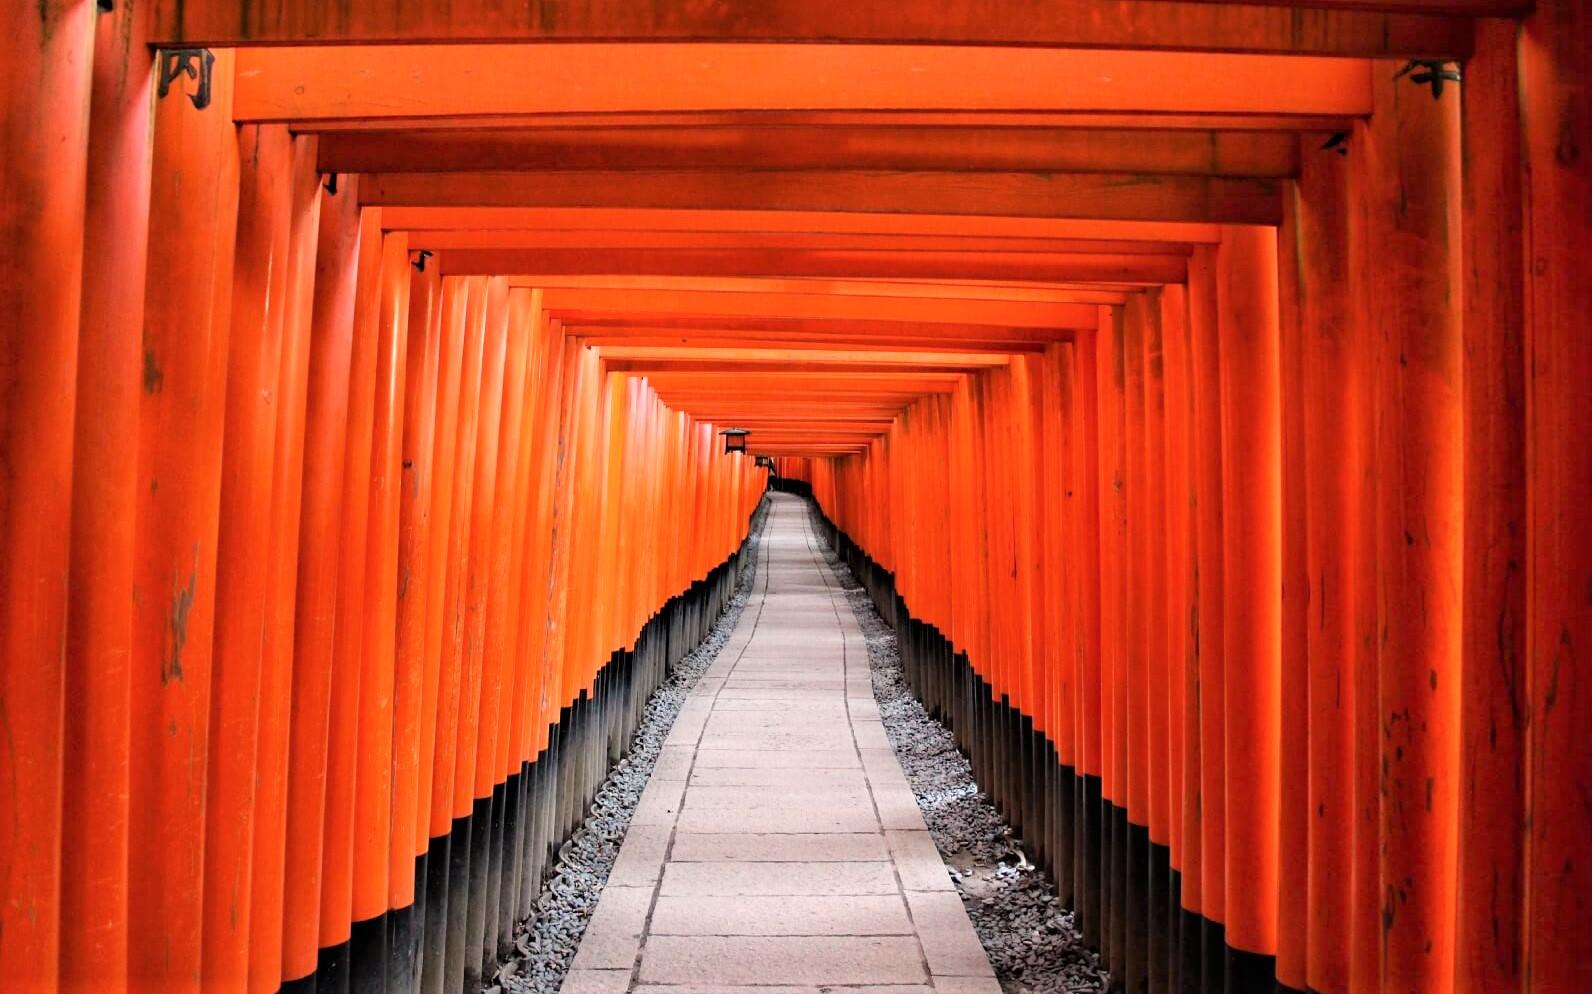 The picturesque vermilion torii gates at Fushimi Inari Taisha